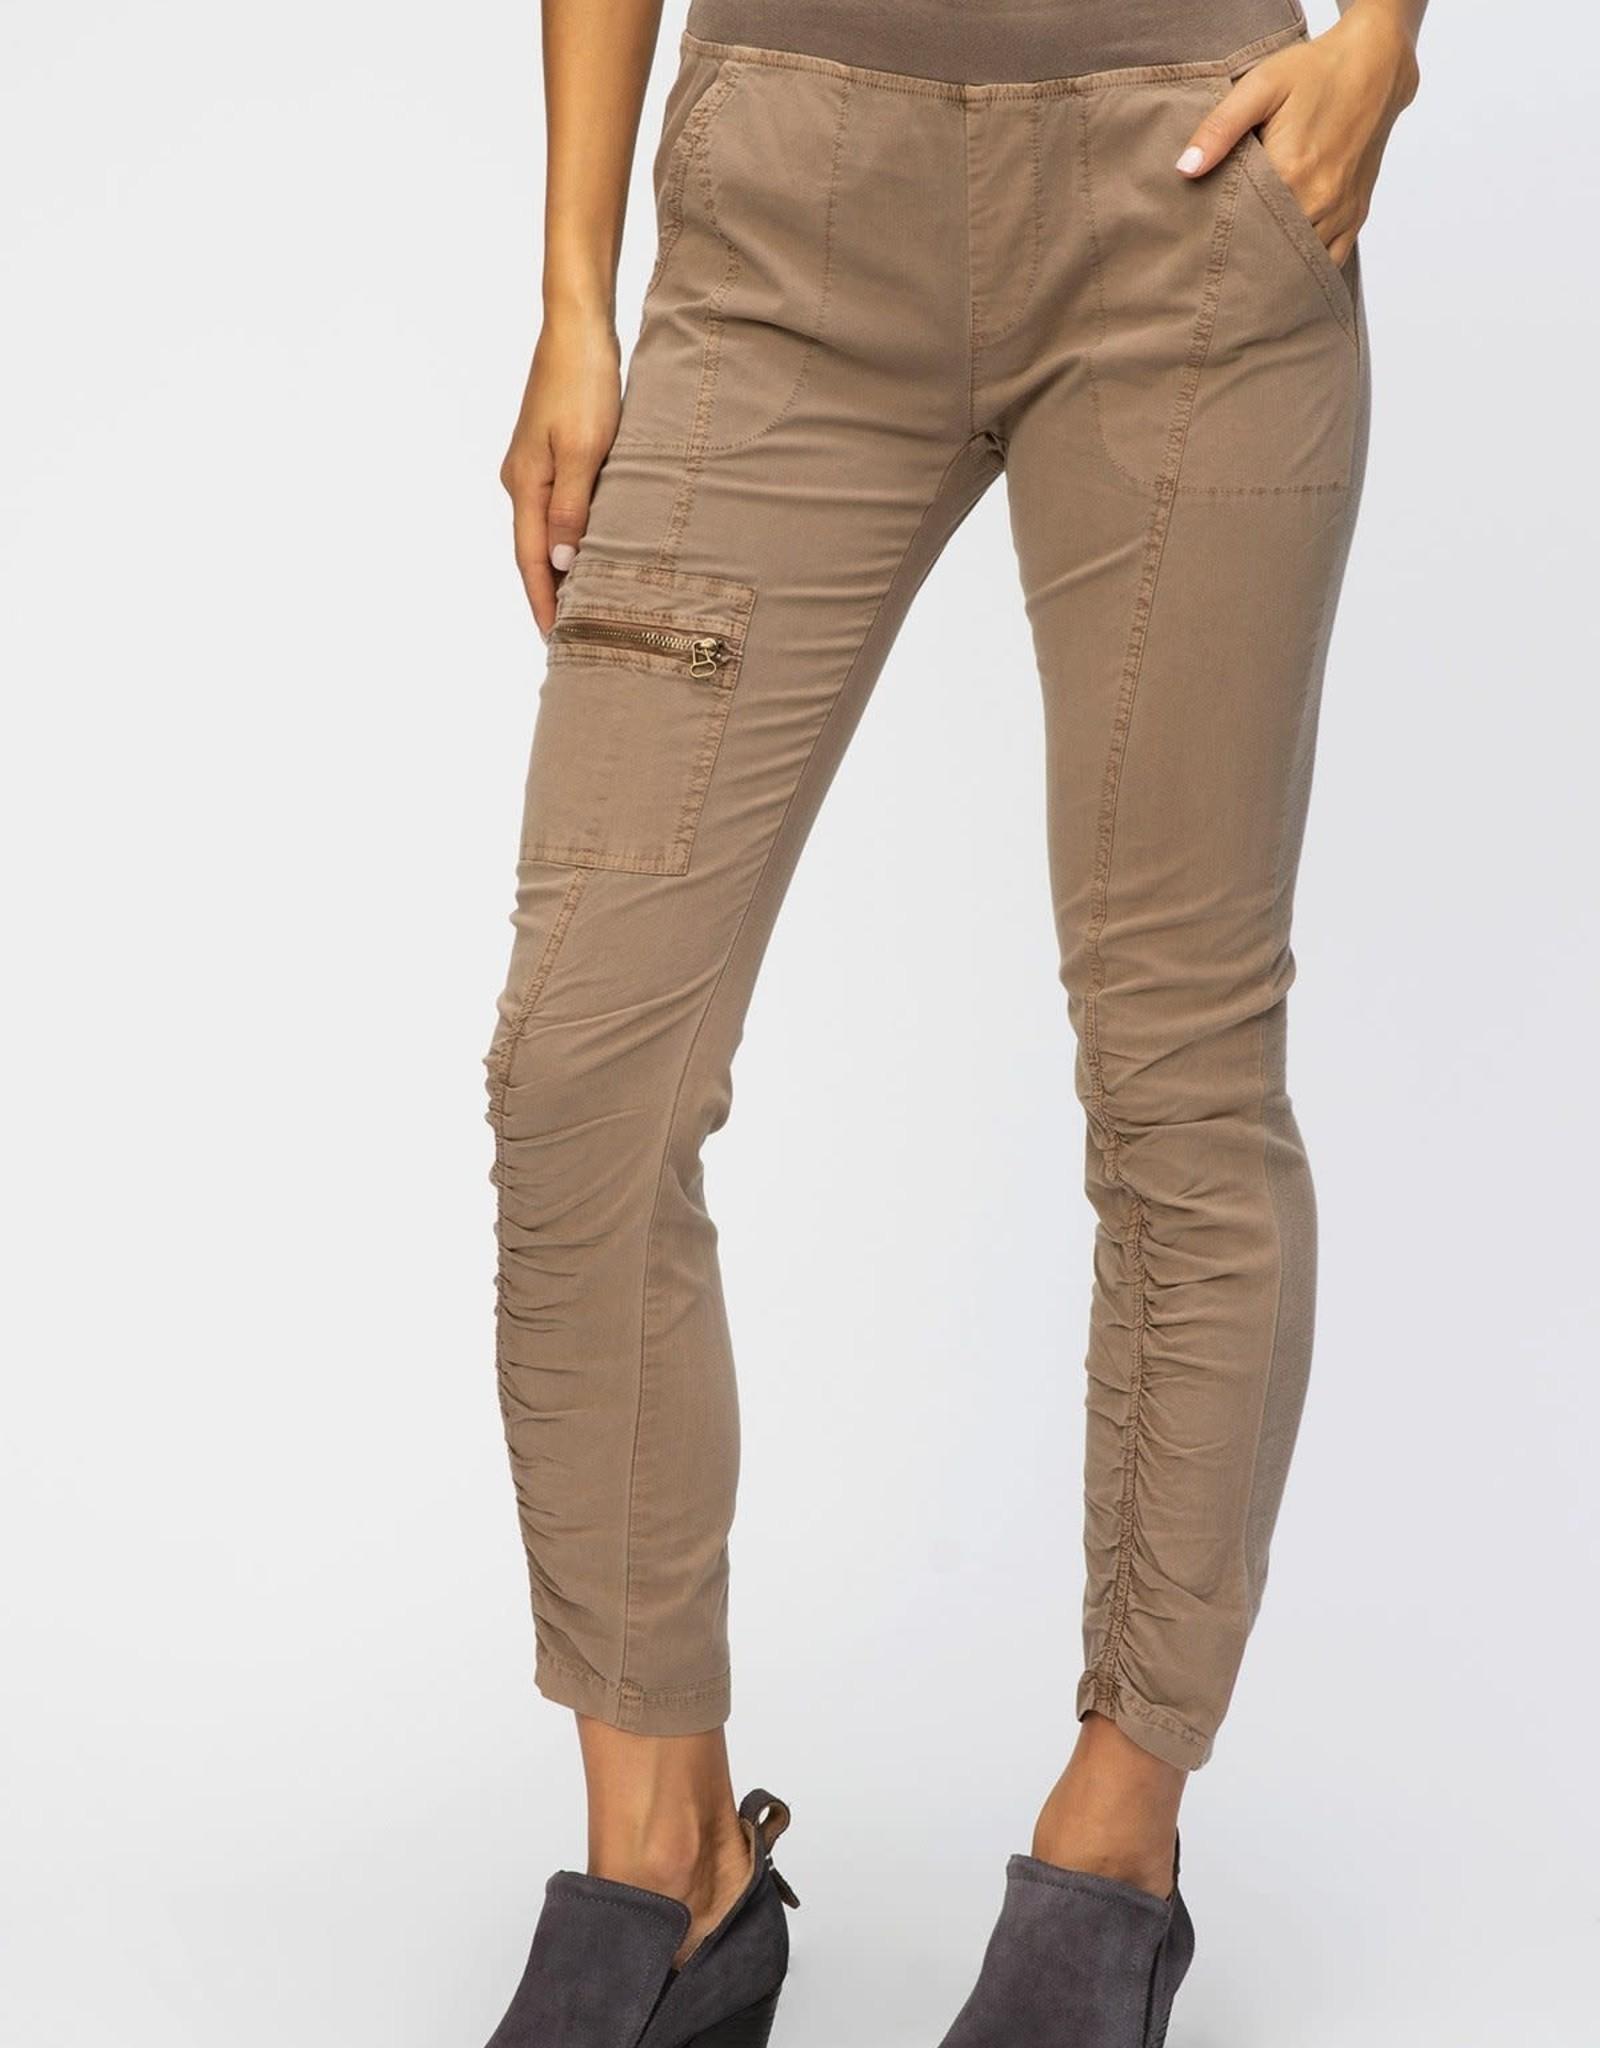 Wearables by XCVI XCVI Malanda Pants